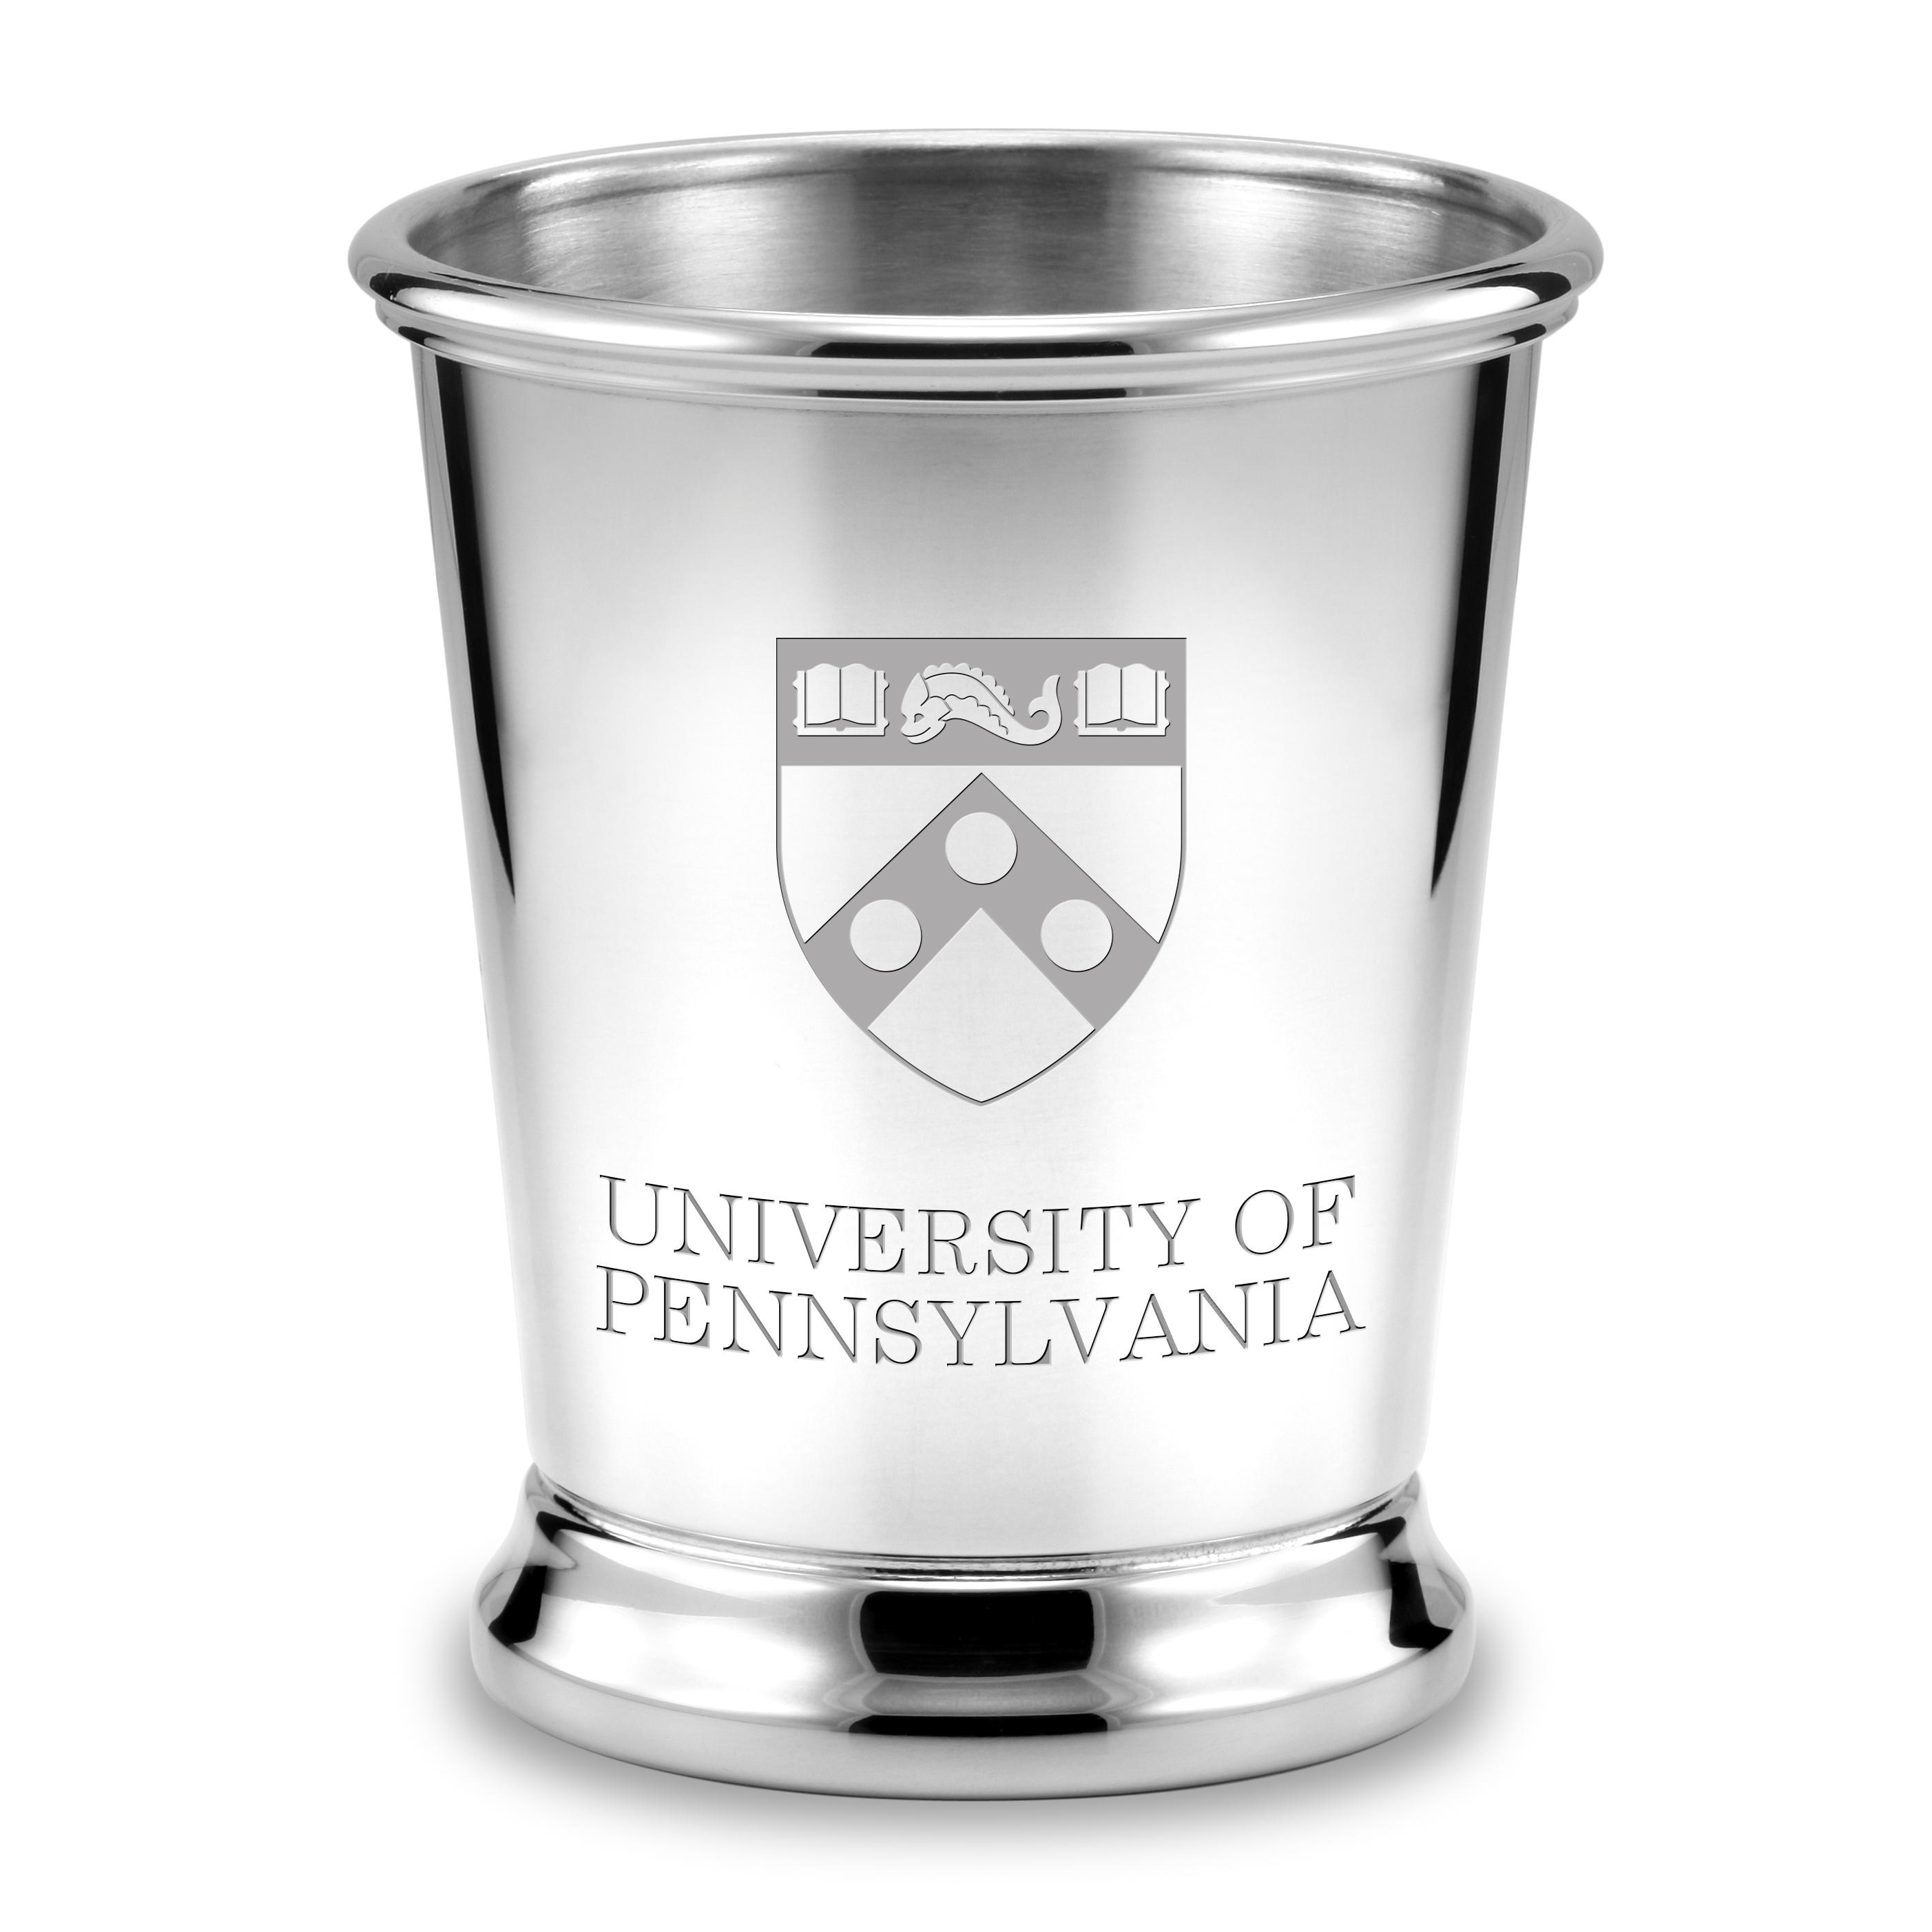 Penn Pewter Julep Cup